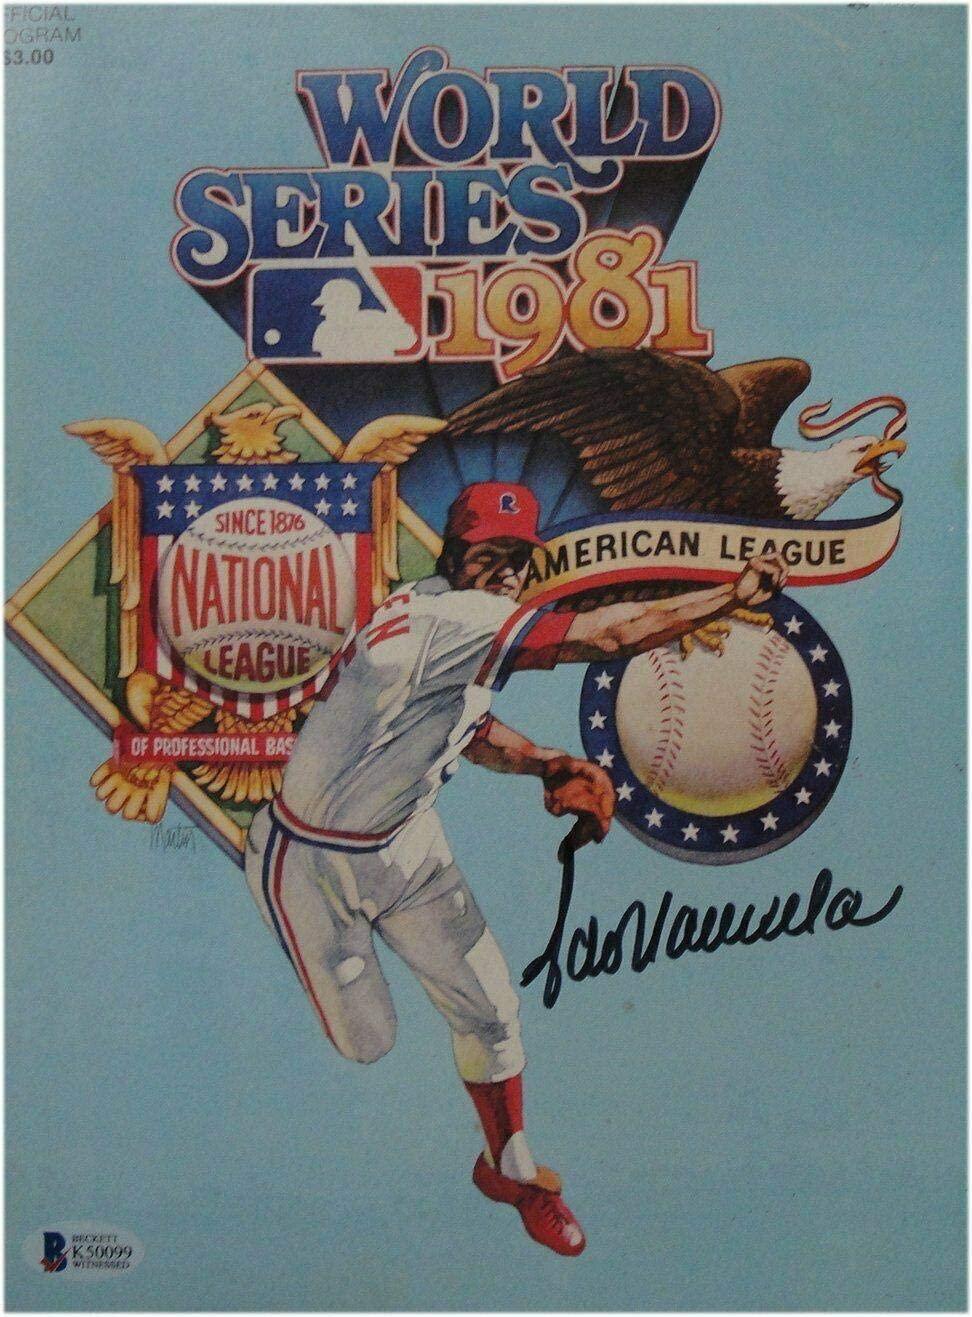 Fernando Valenzuela Signed Auto Los Angeles Dodgers 1981 WS Program Beckett - Beckett Authentication